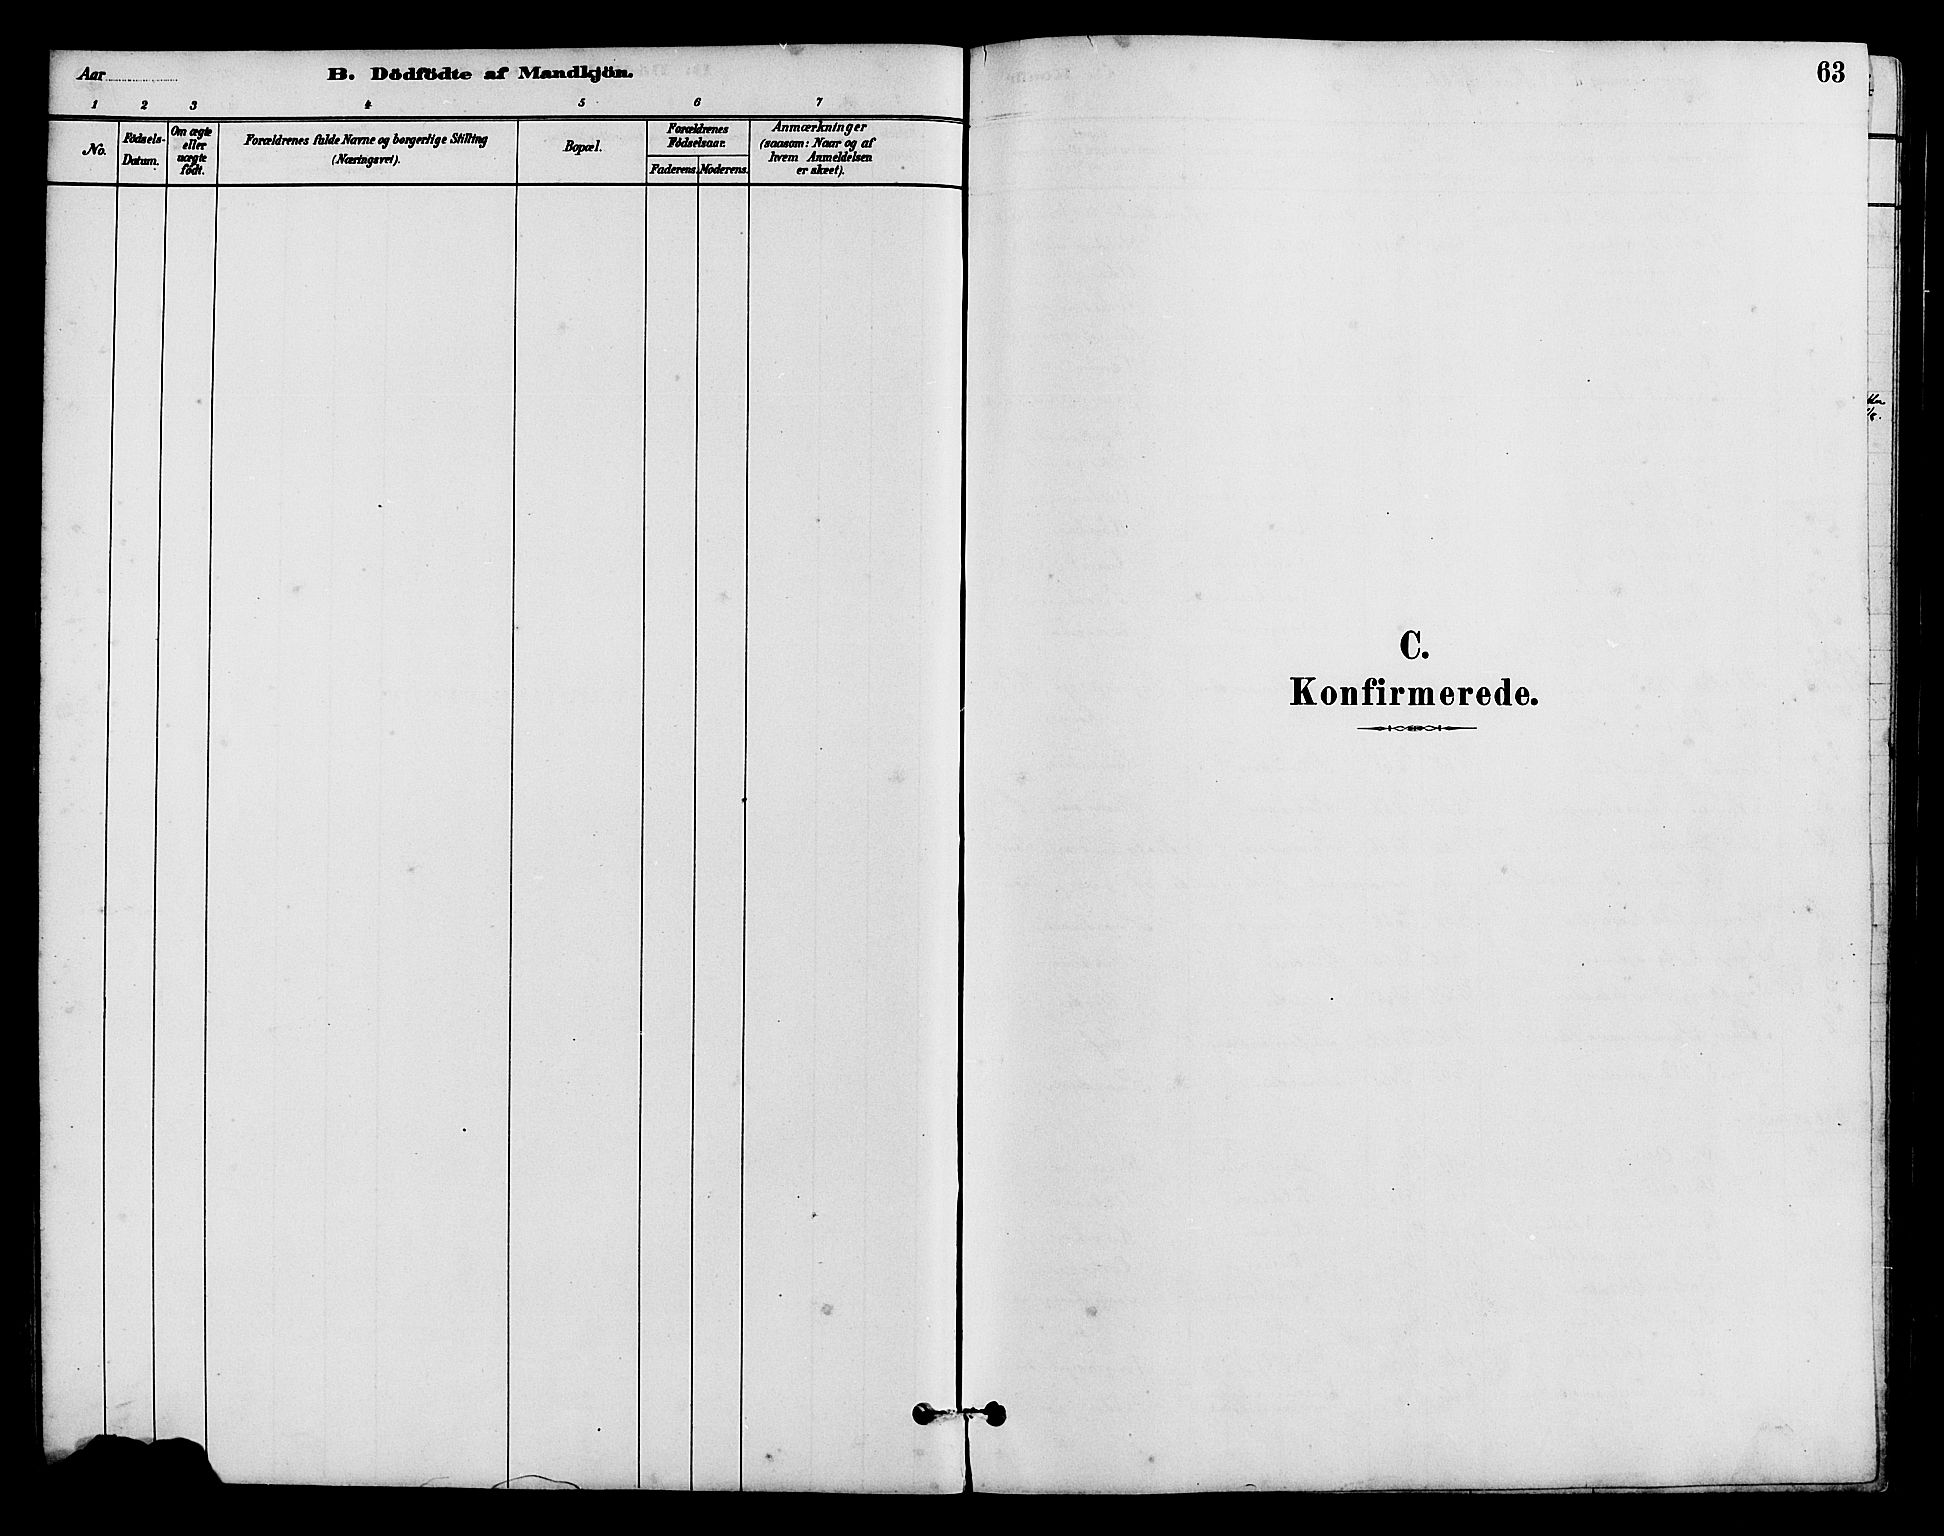 SAH, Vestre Slidre prestekontor, Klokkerbok nr. 5, 1881-1913, s. 63